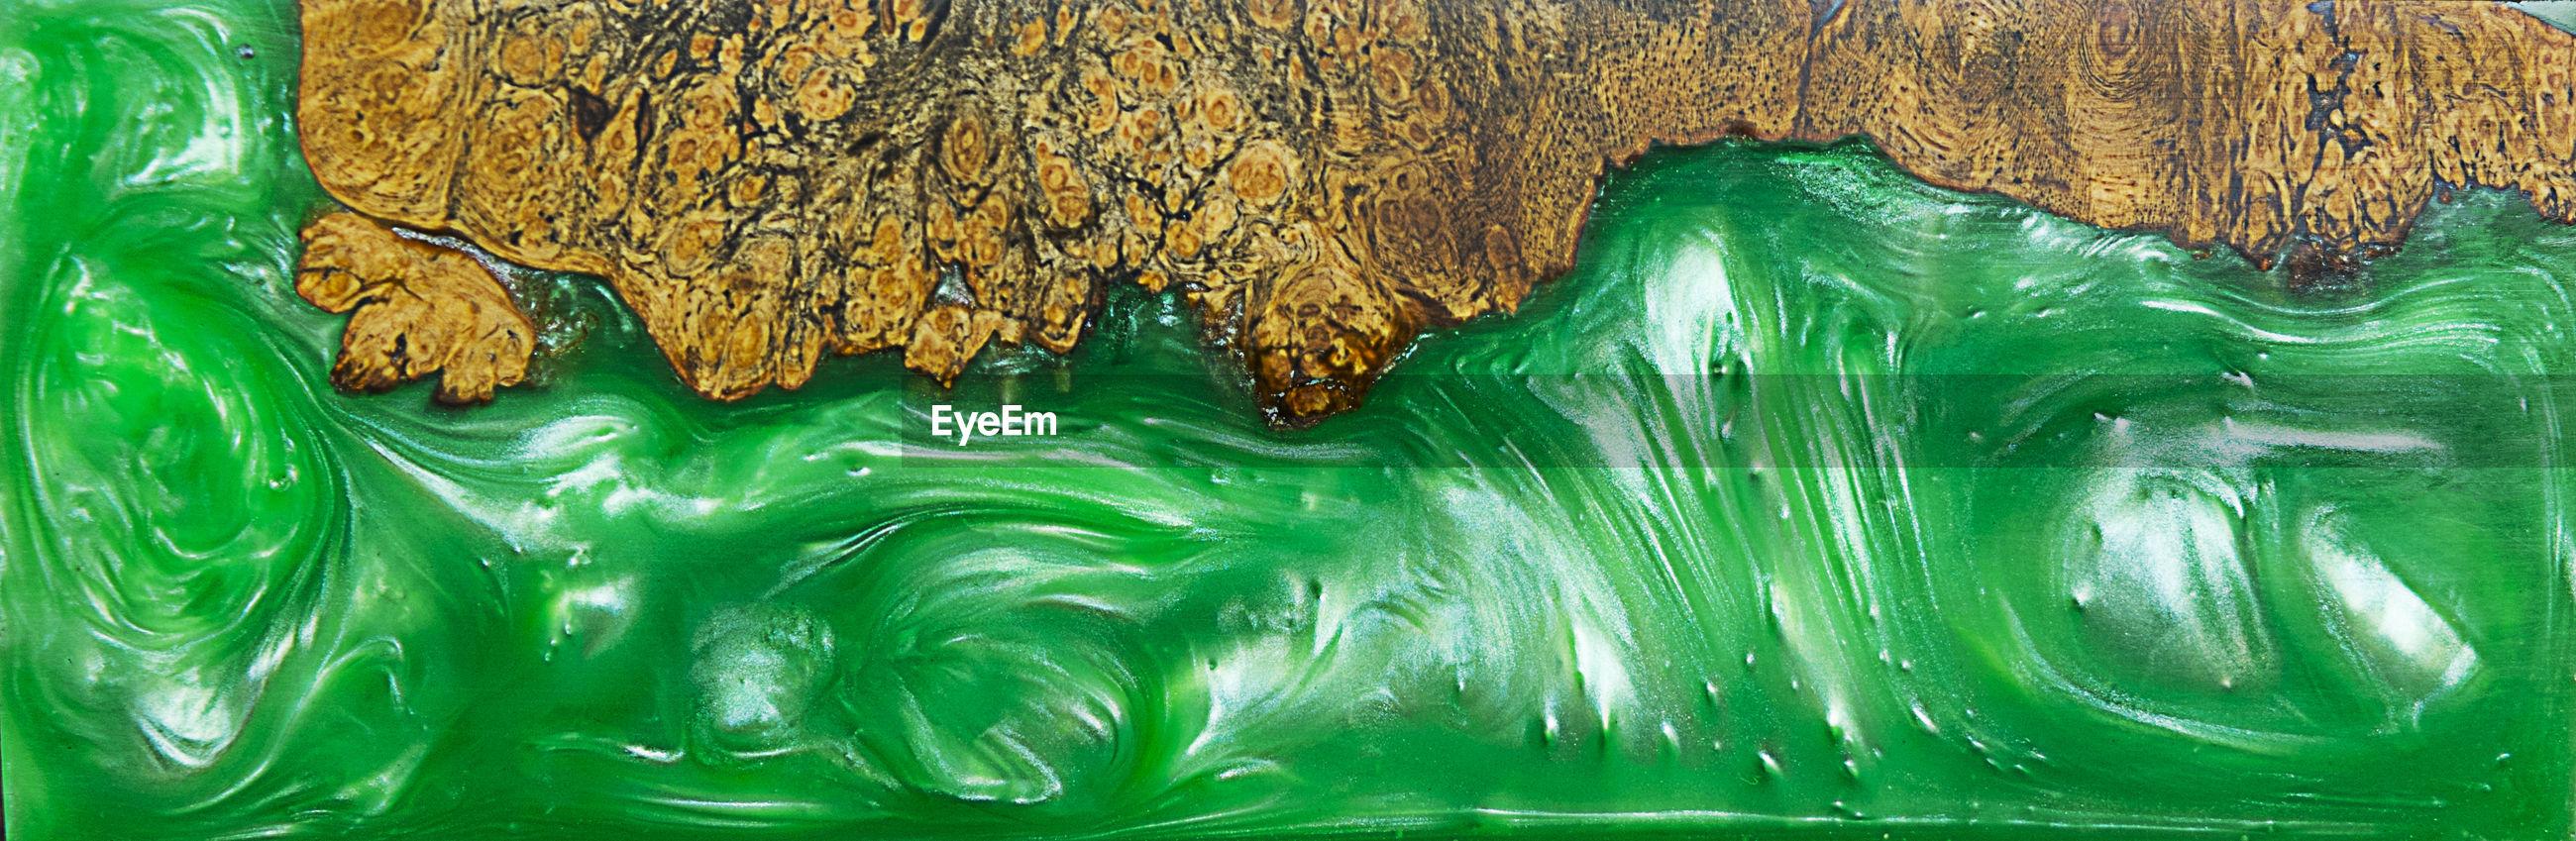 FULL FRAME SHOT OF GREEN LEAF IN WATER